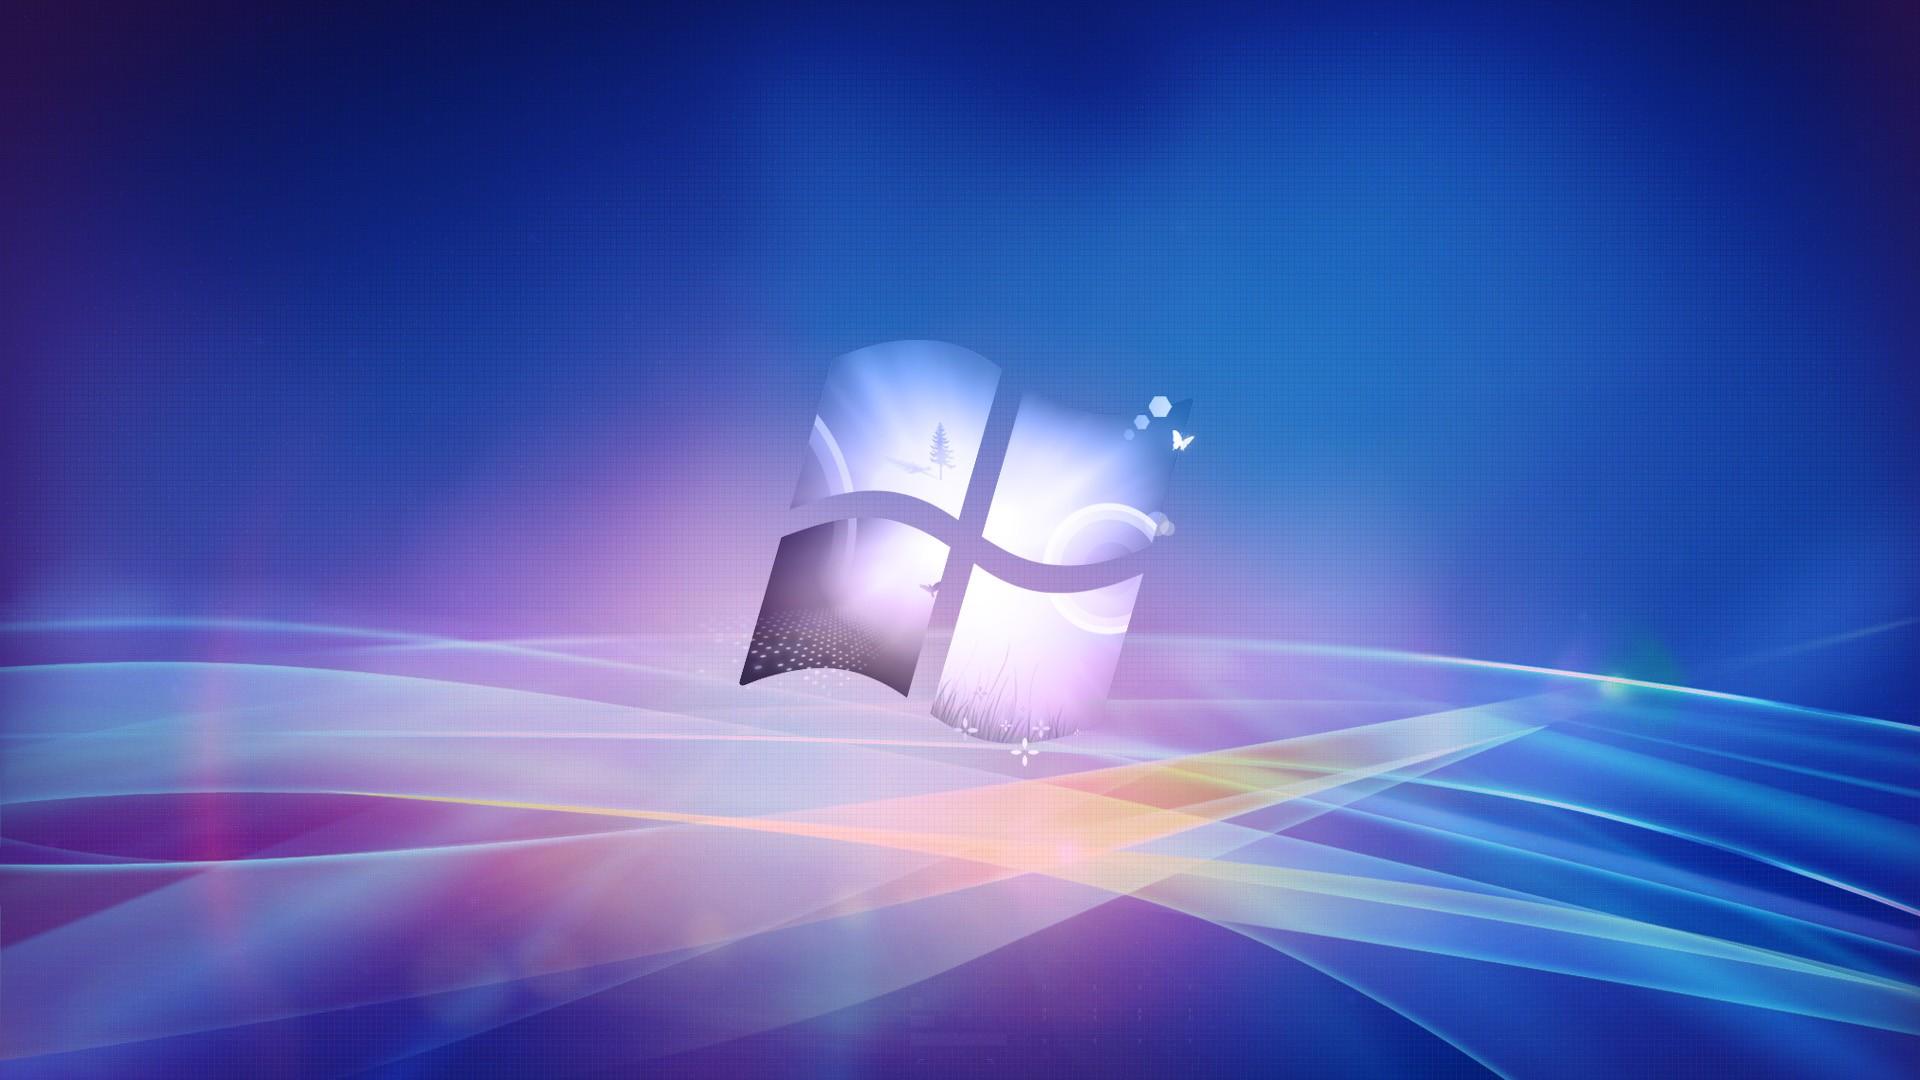 Windows Desktop Background image information 1920x1080 1920x1080